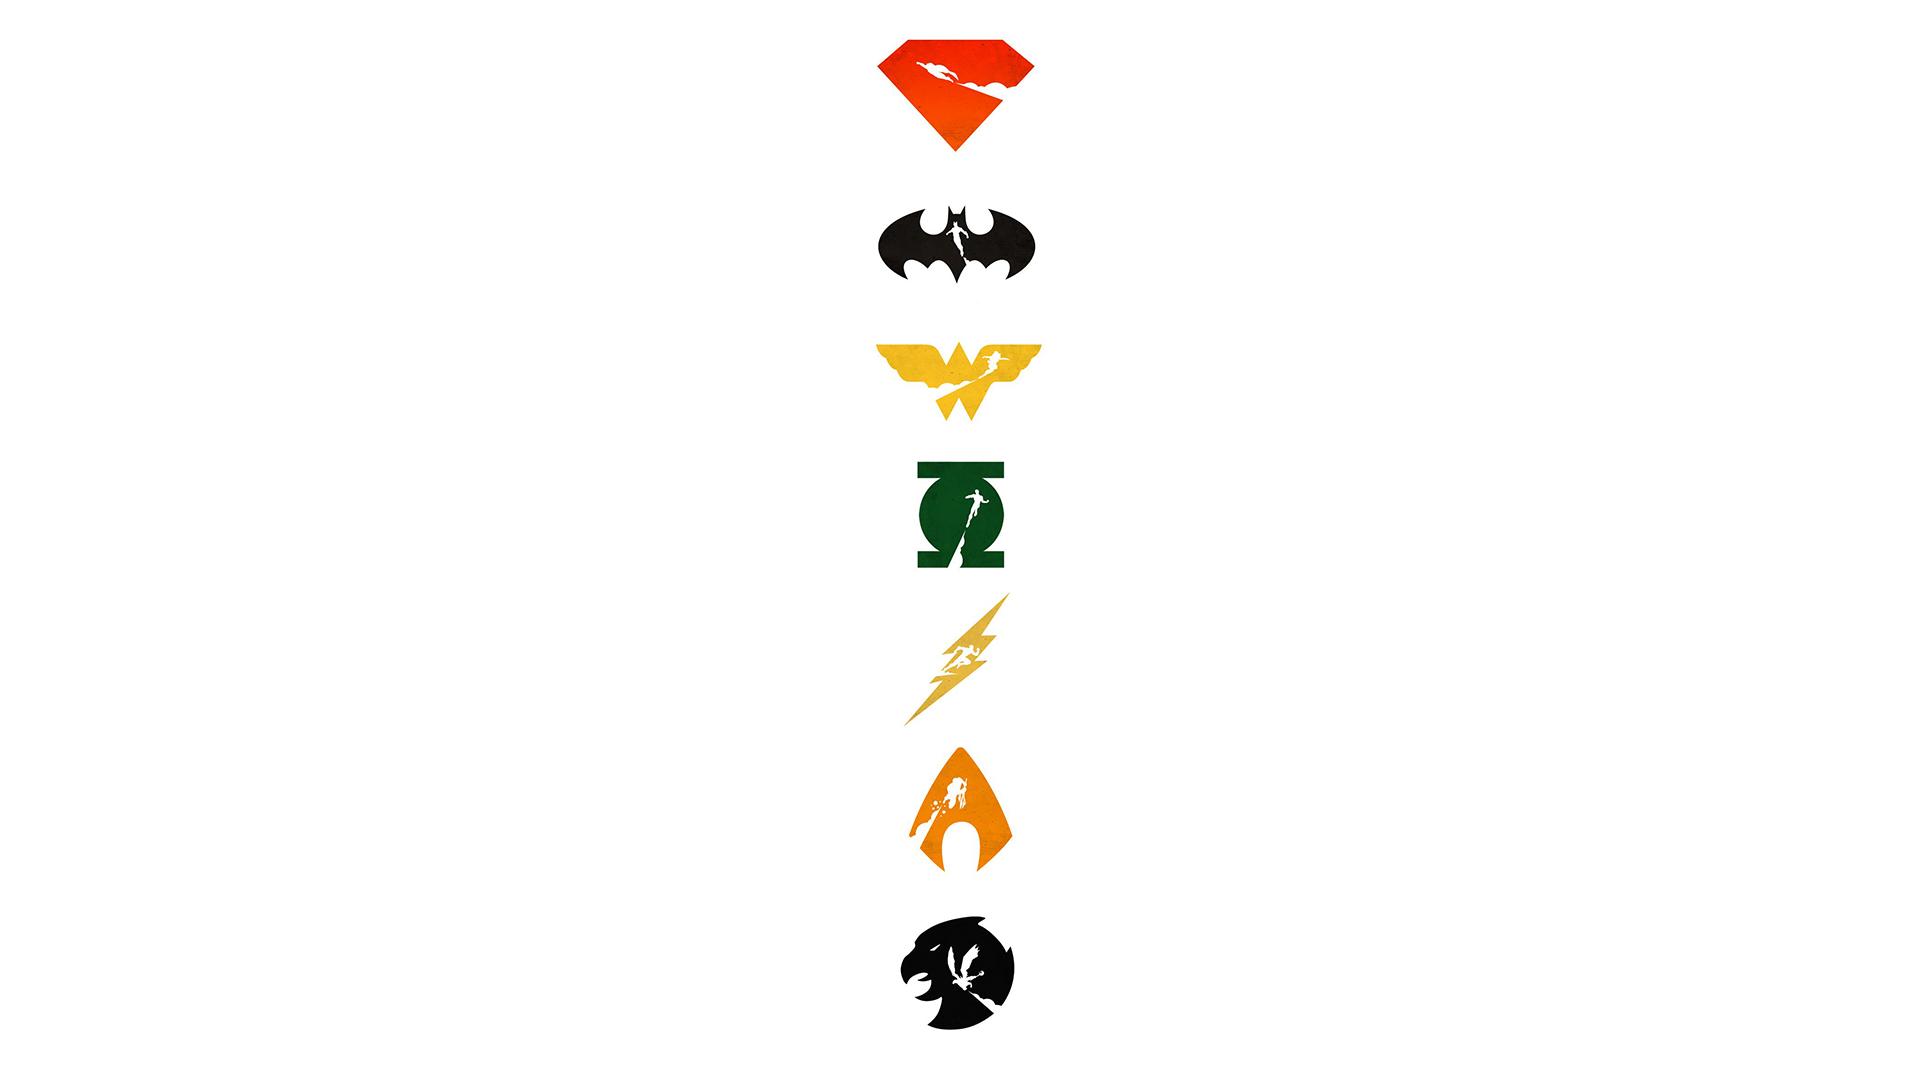 Amazing Wallpaper Logo Justice League - justice-league-logo-art-w0  Photograph_291324.jpg